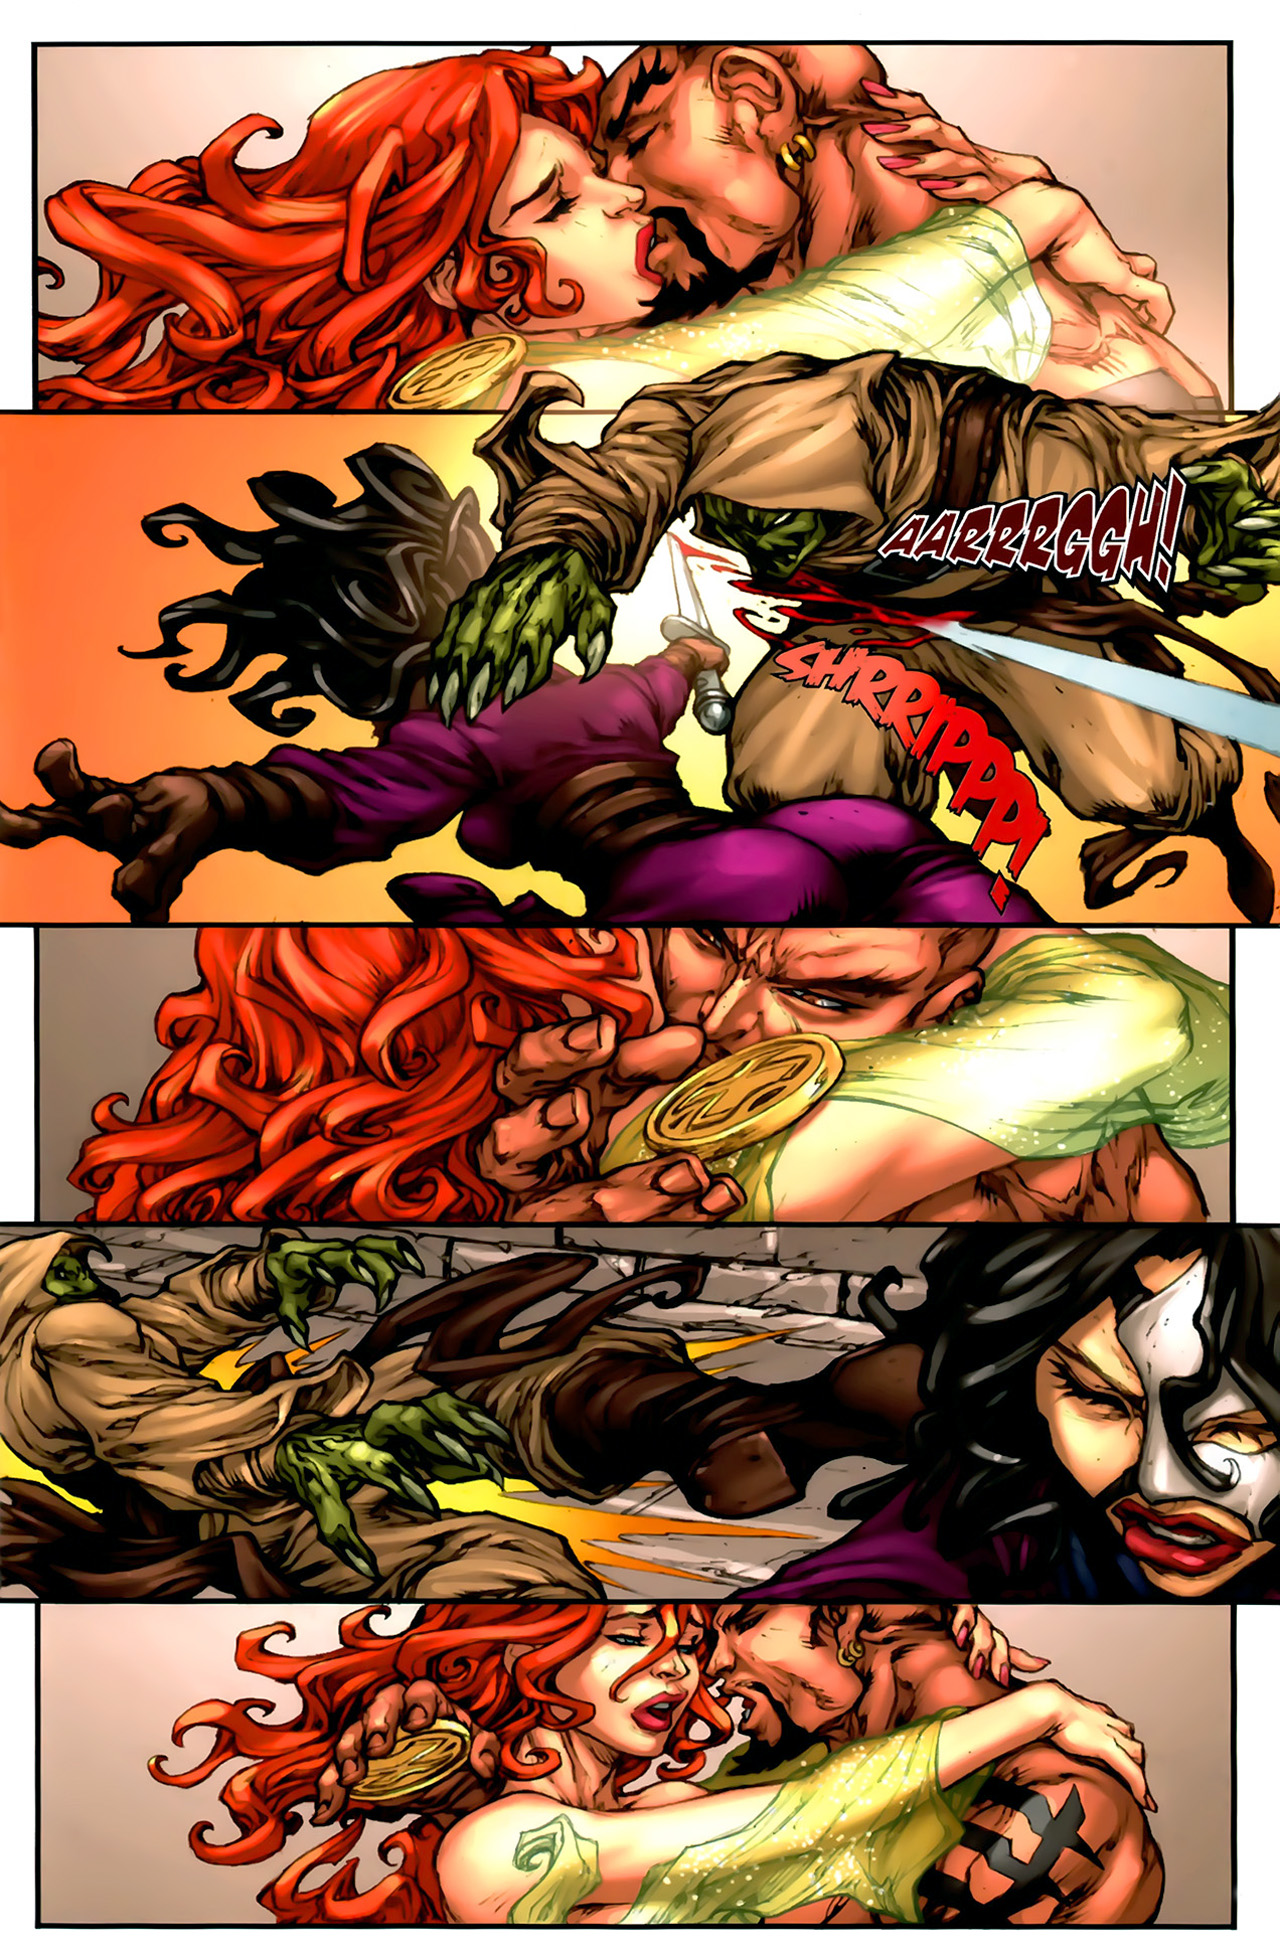 Read online 1001 Arabian Nights: The Adventures of Sinbad comic -  Issue #2 - 11